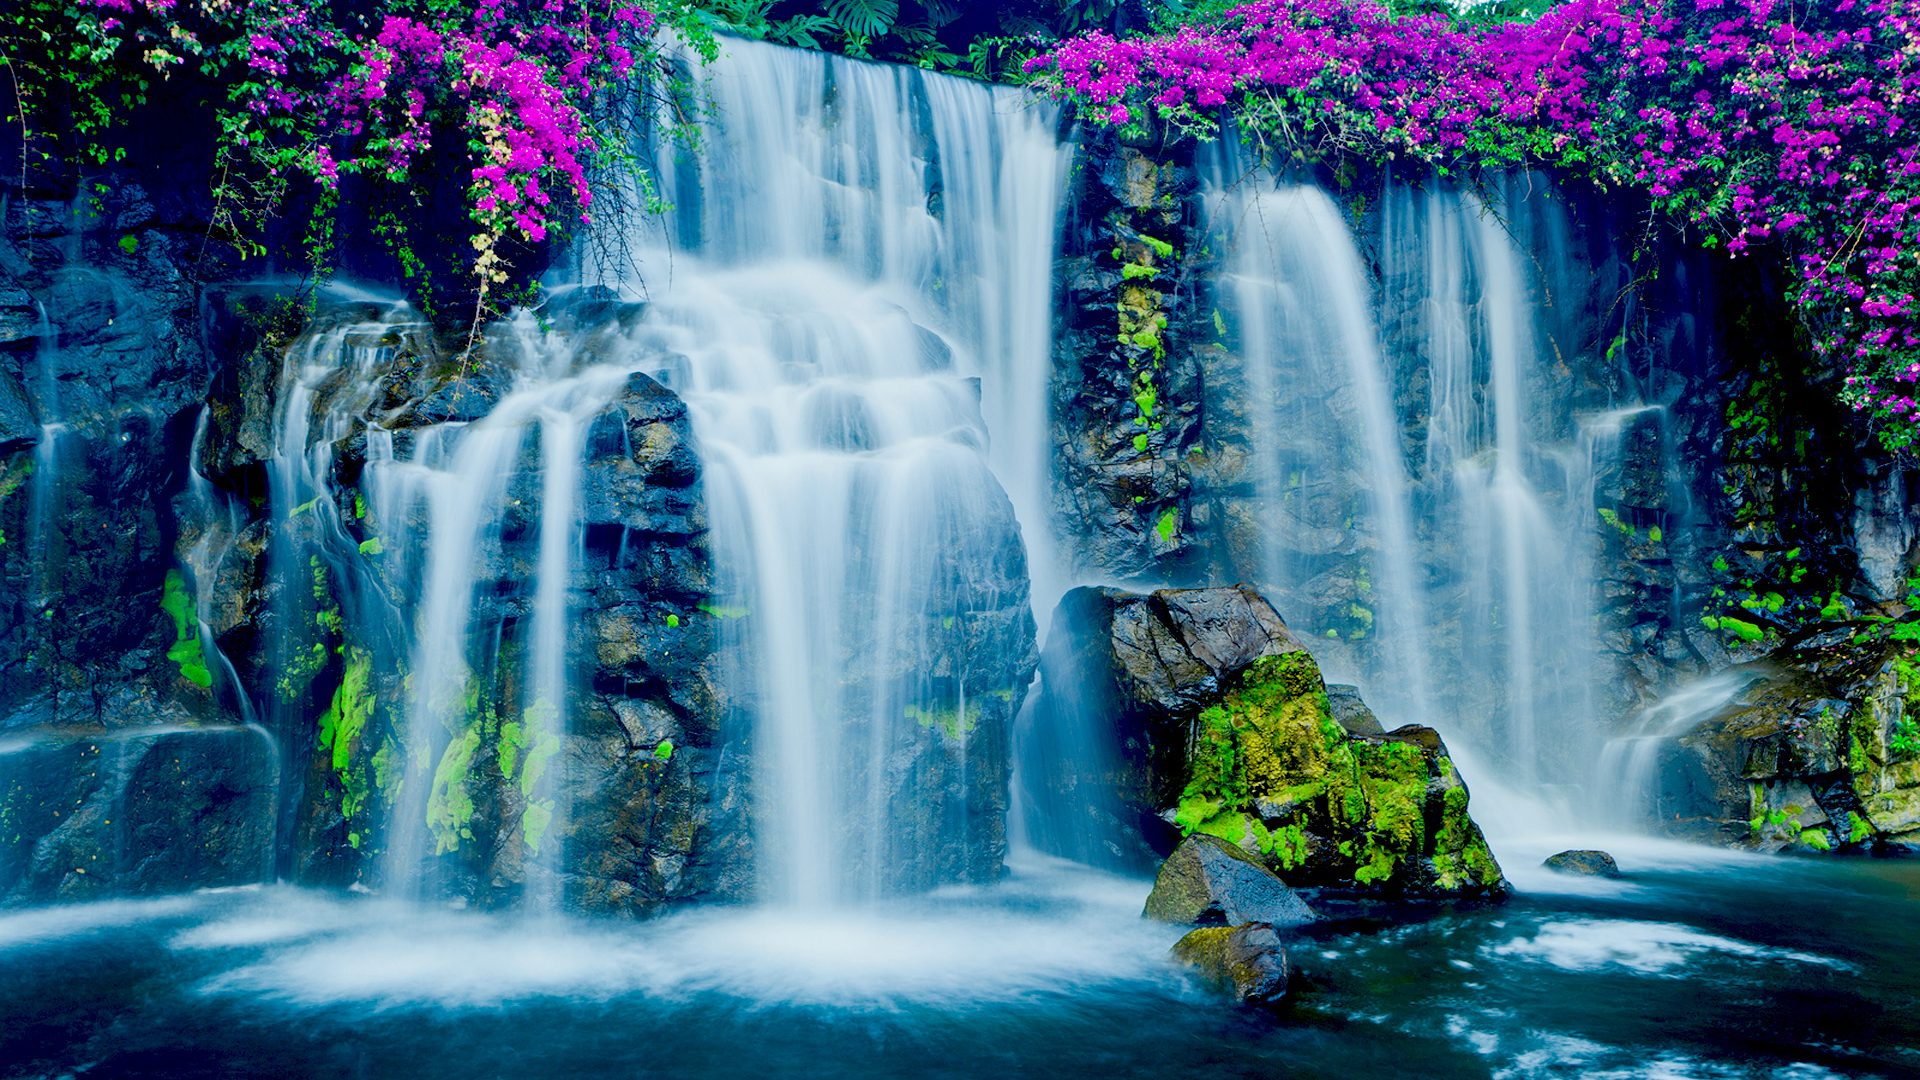 Фото на рабочий стол живые обои водопад